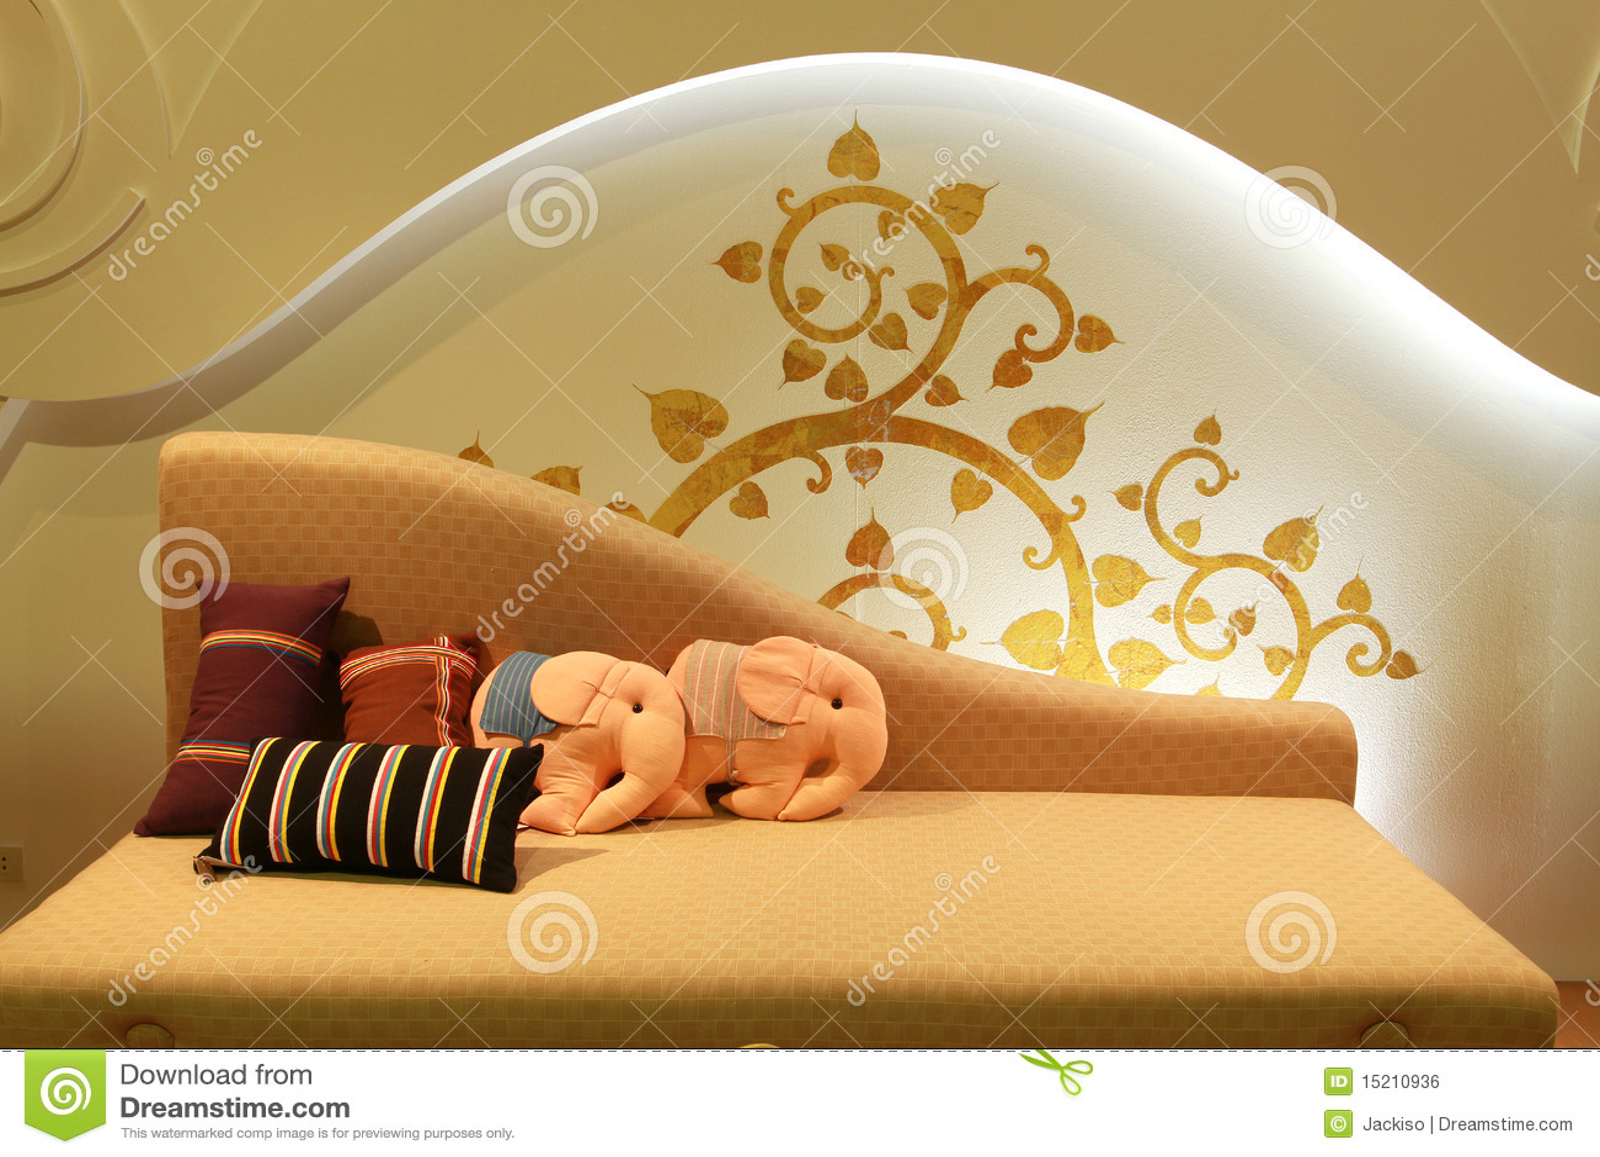 Interior bed design  Interior Bed Design Royalty Free Stock Image Image  15210936. Bed Dizain